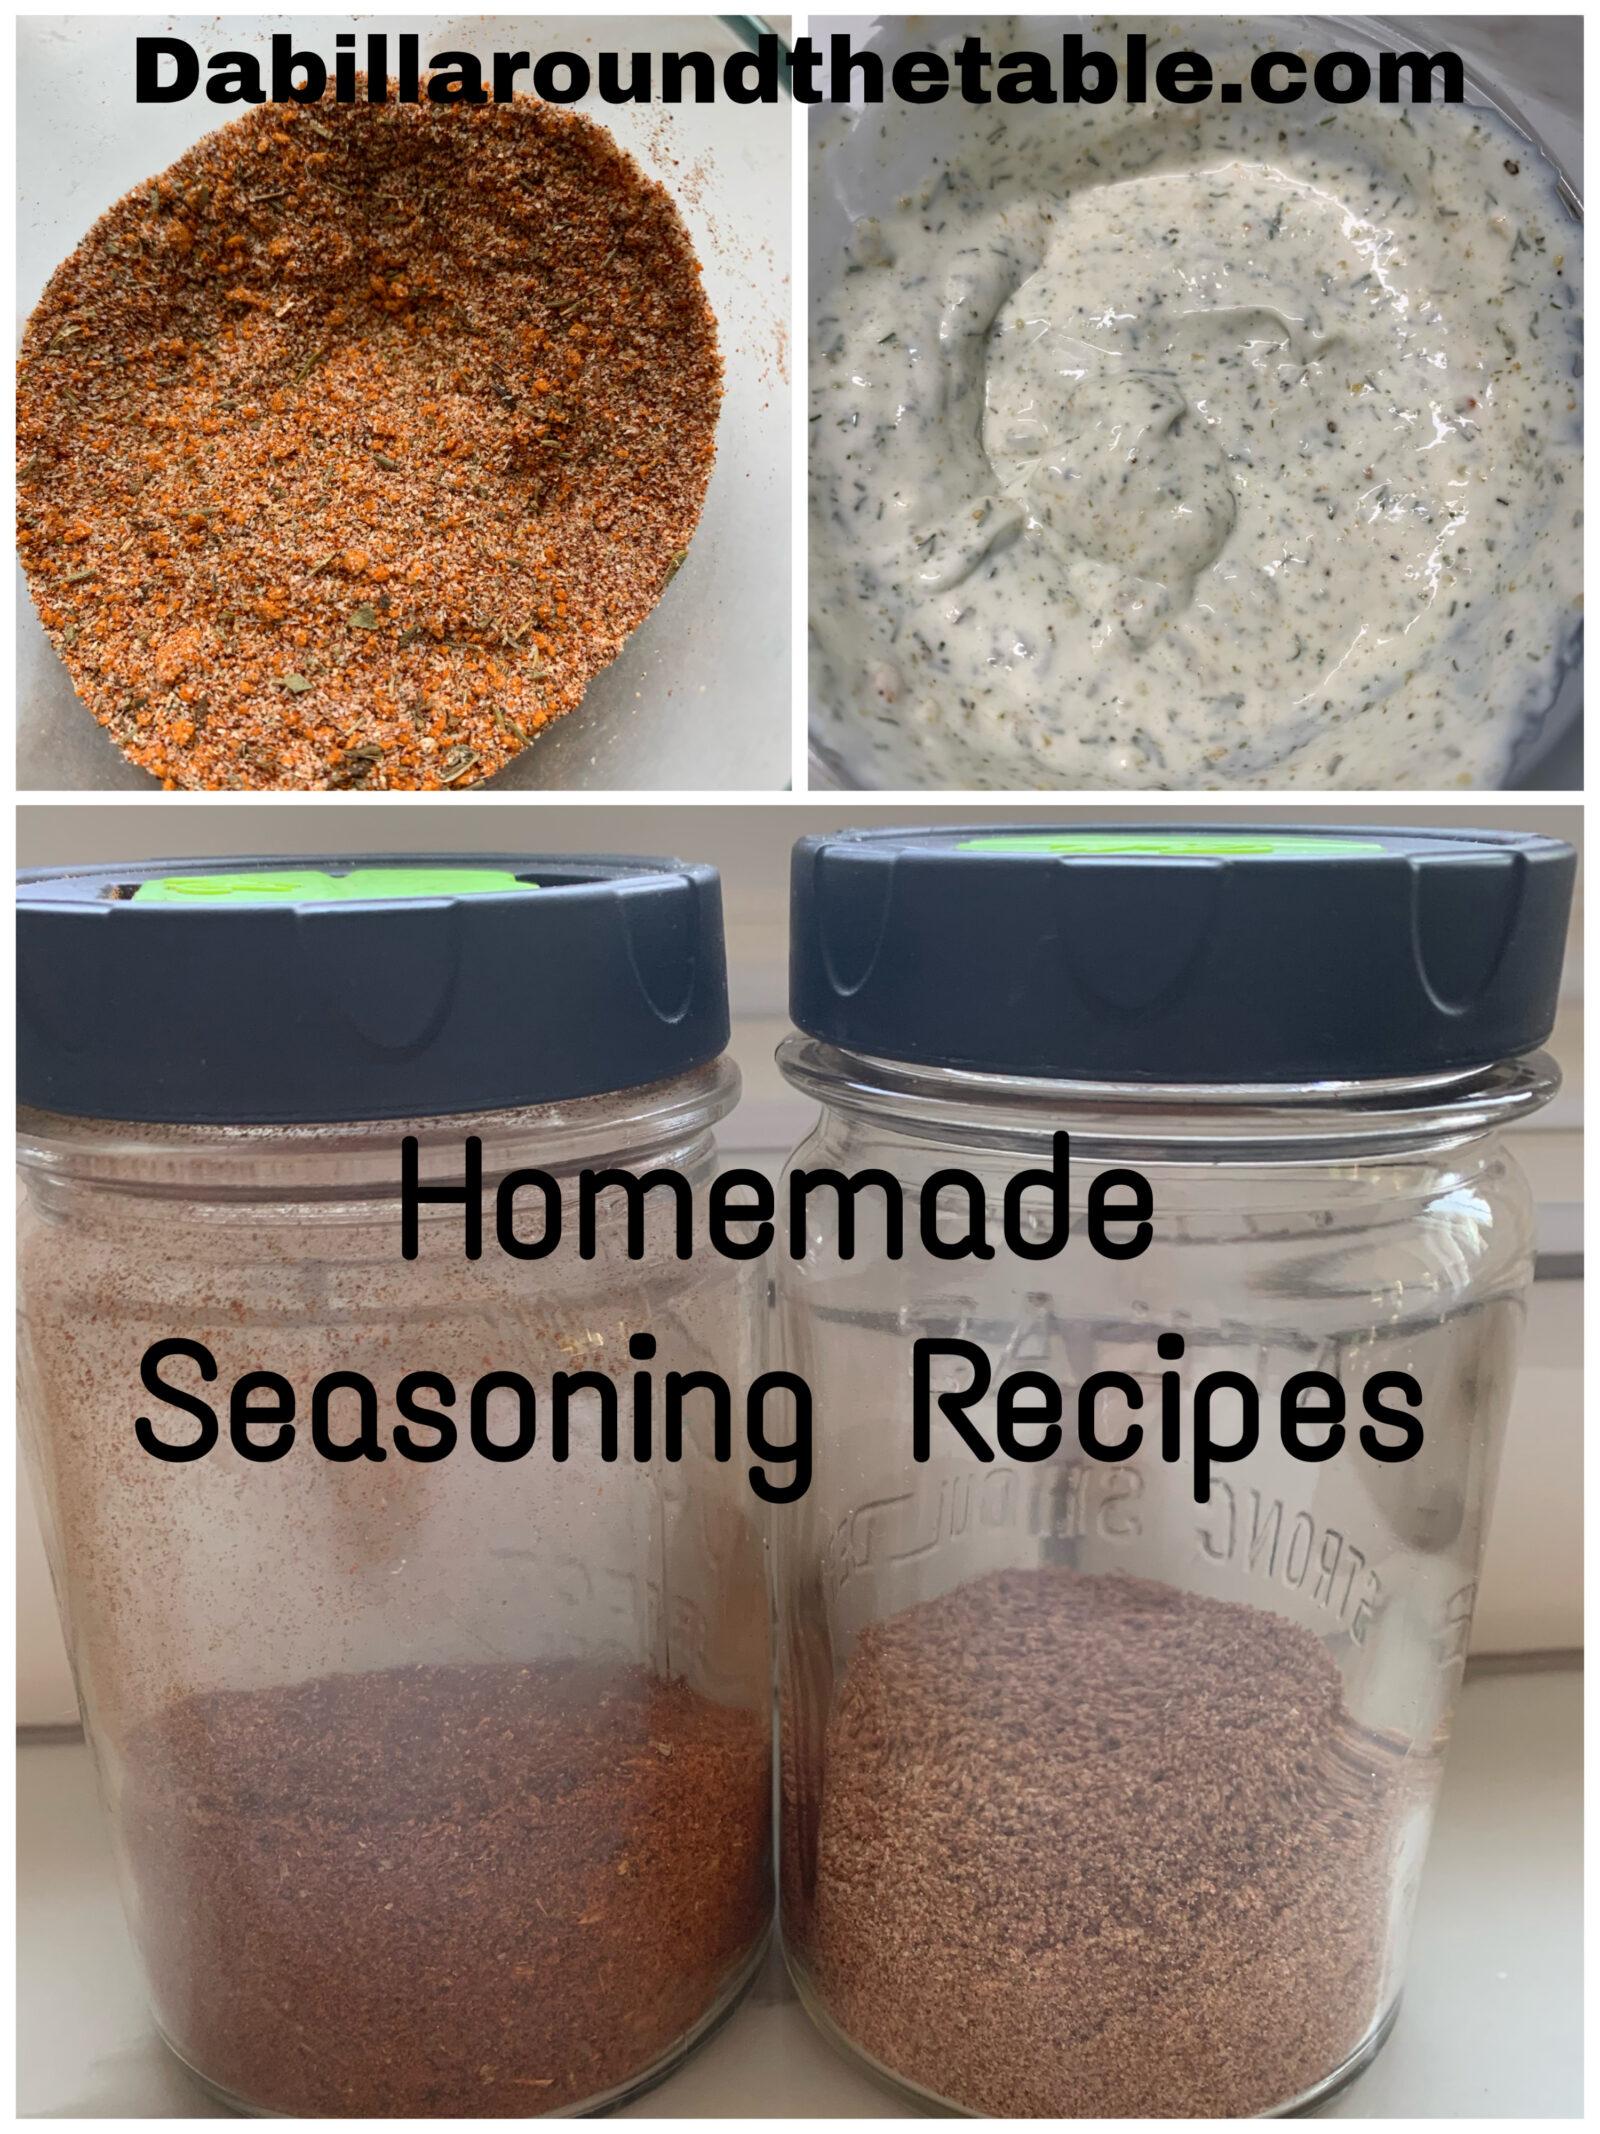 Homemade Seasoning Recipes and More